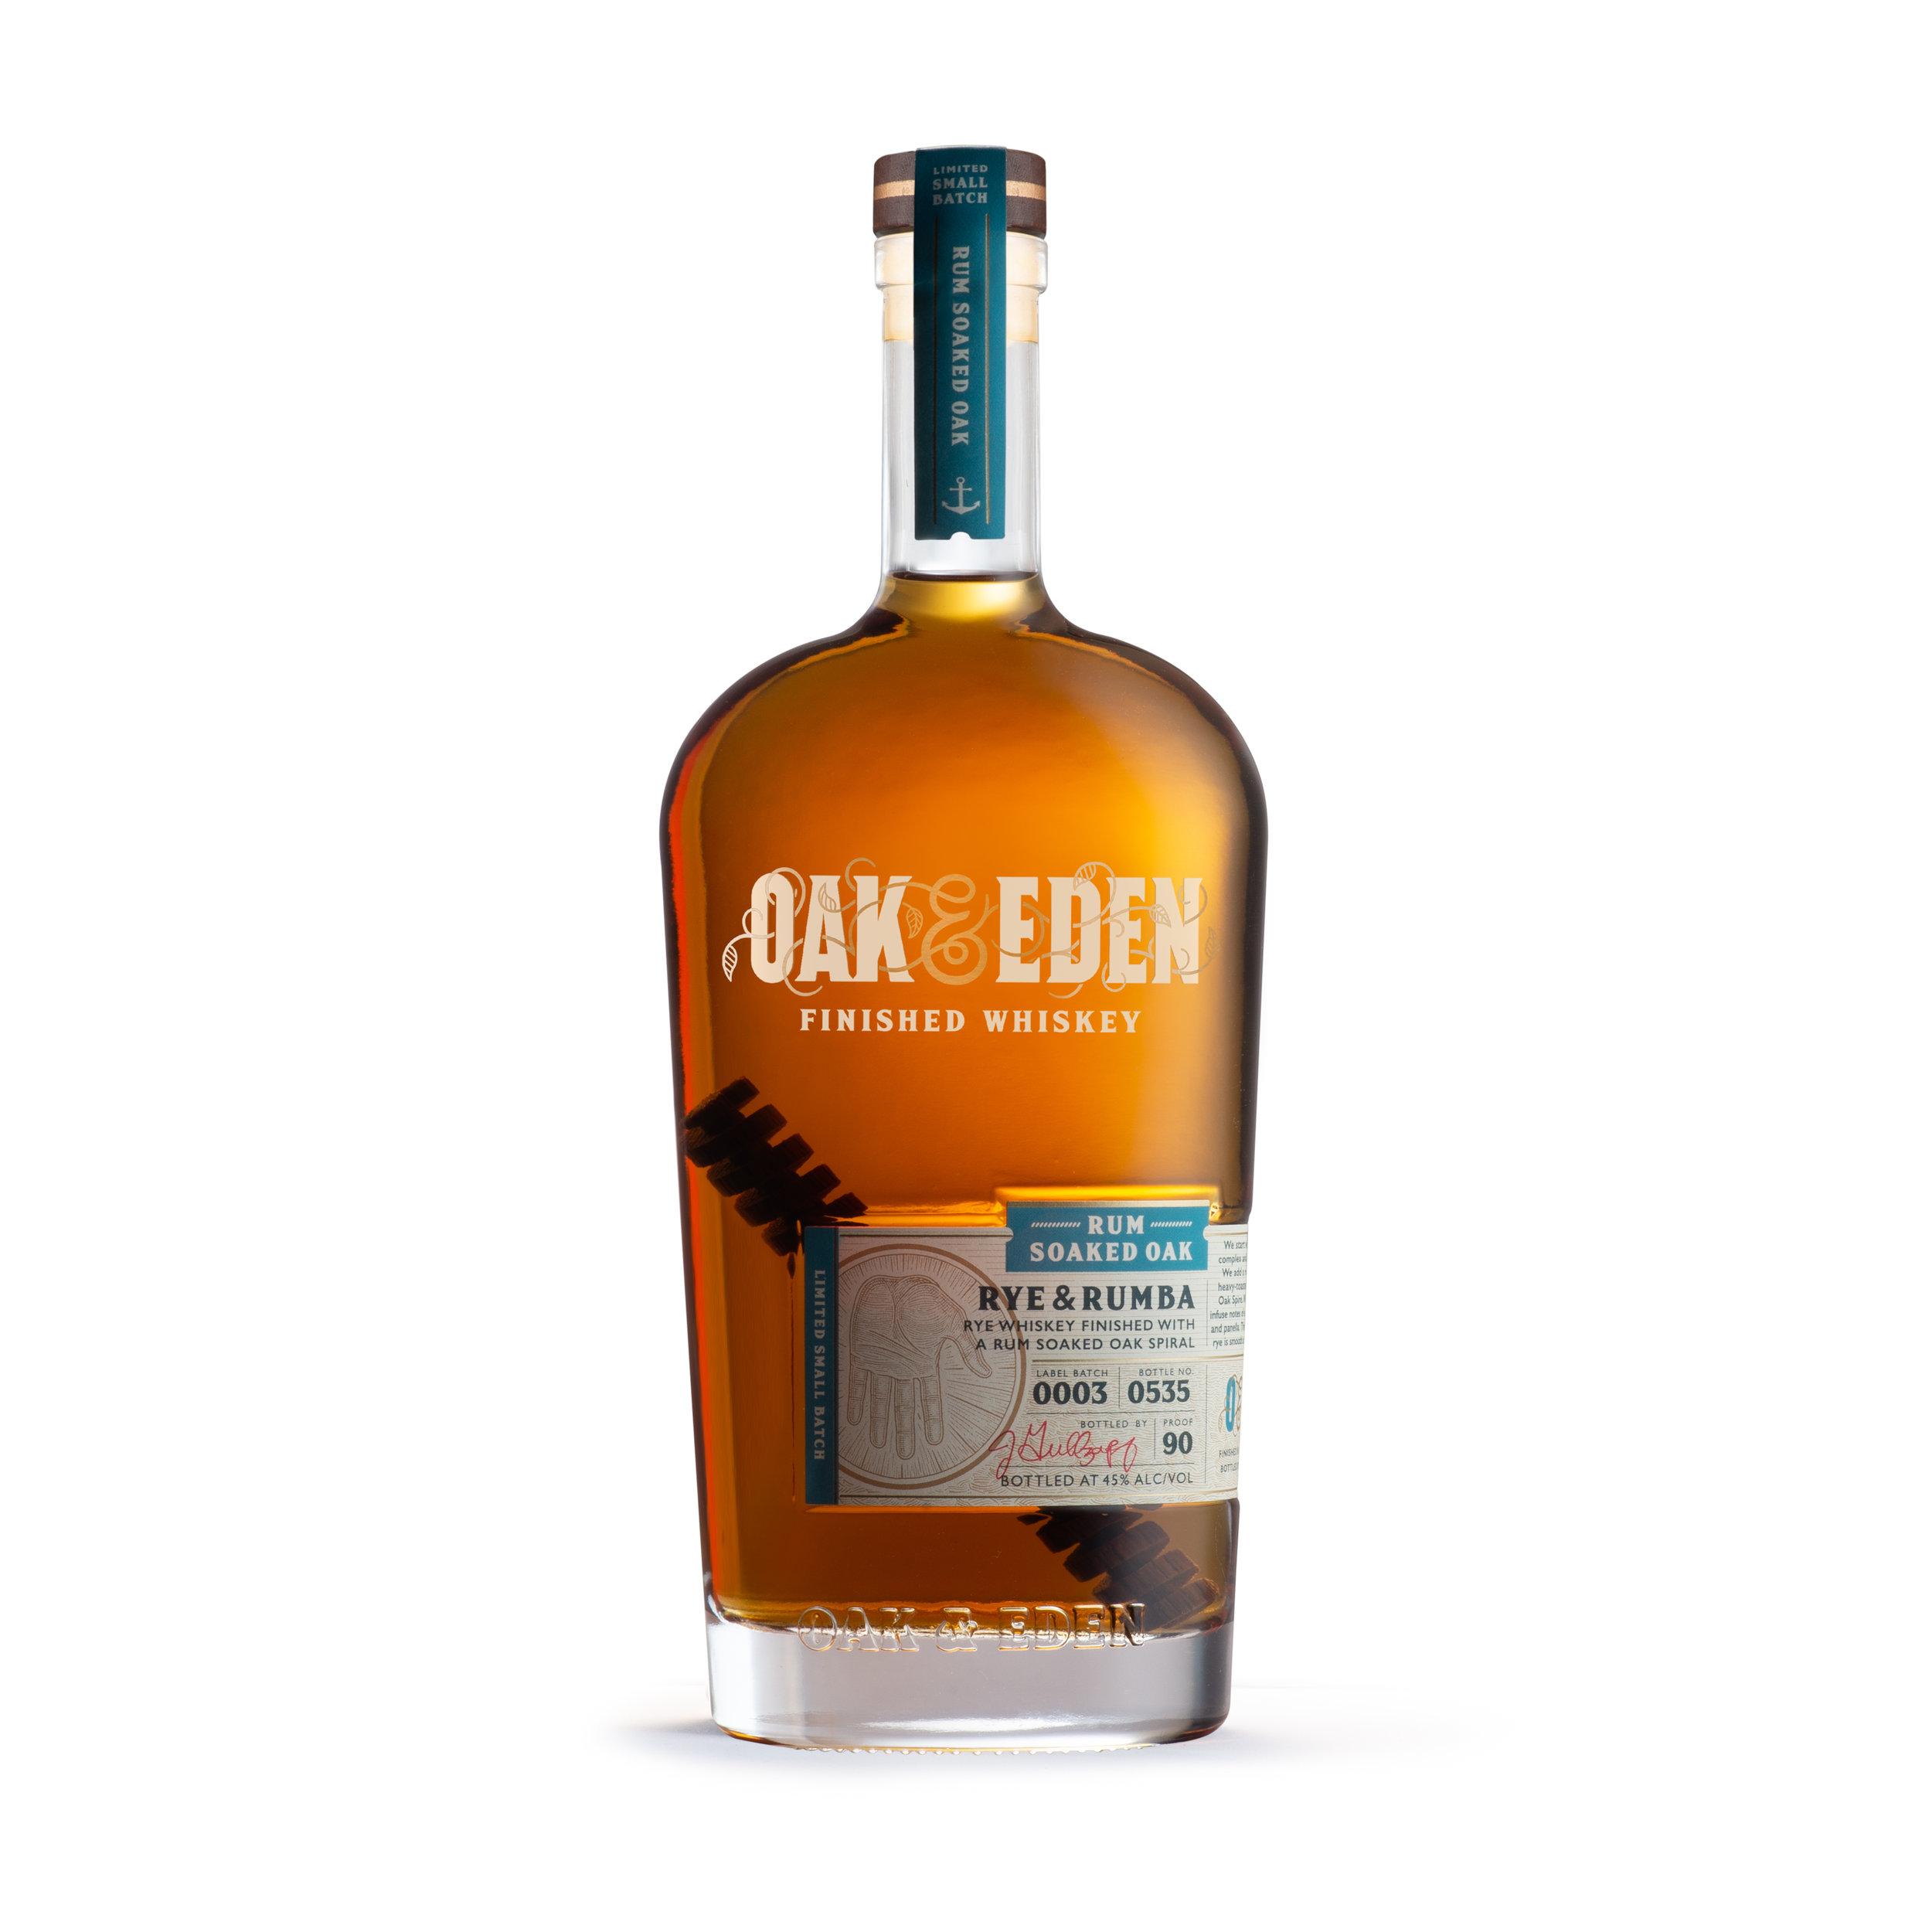 OAK-AND-EDEN-FINALS-006.jpg